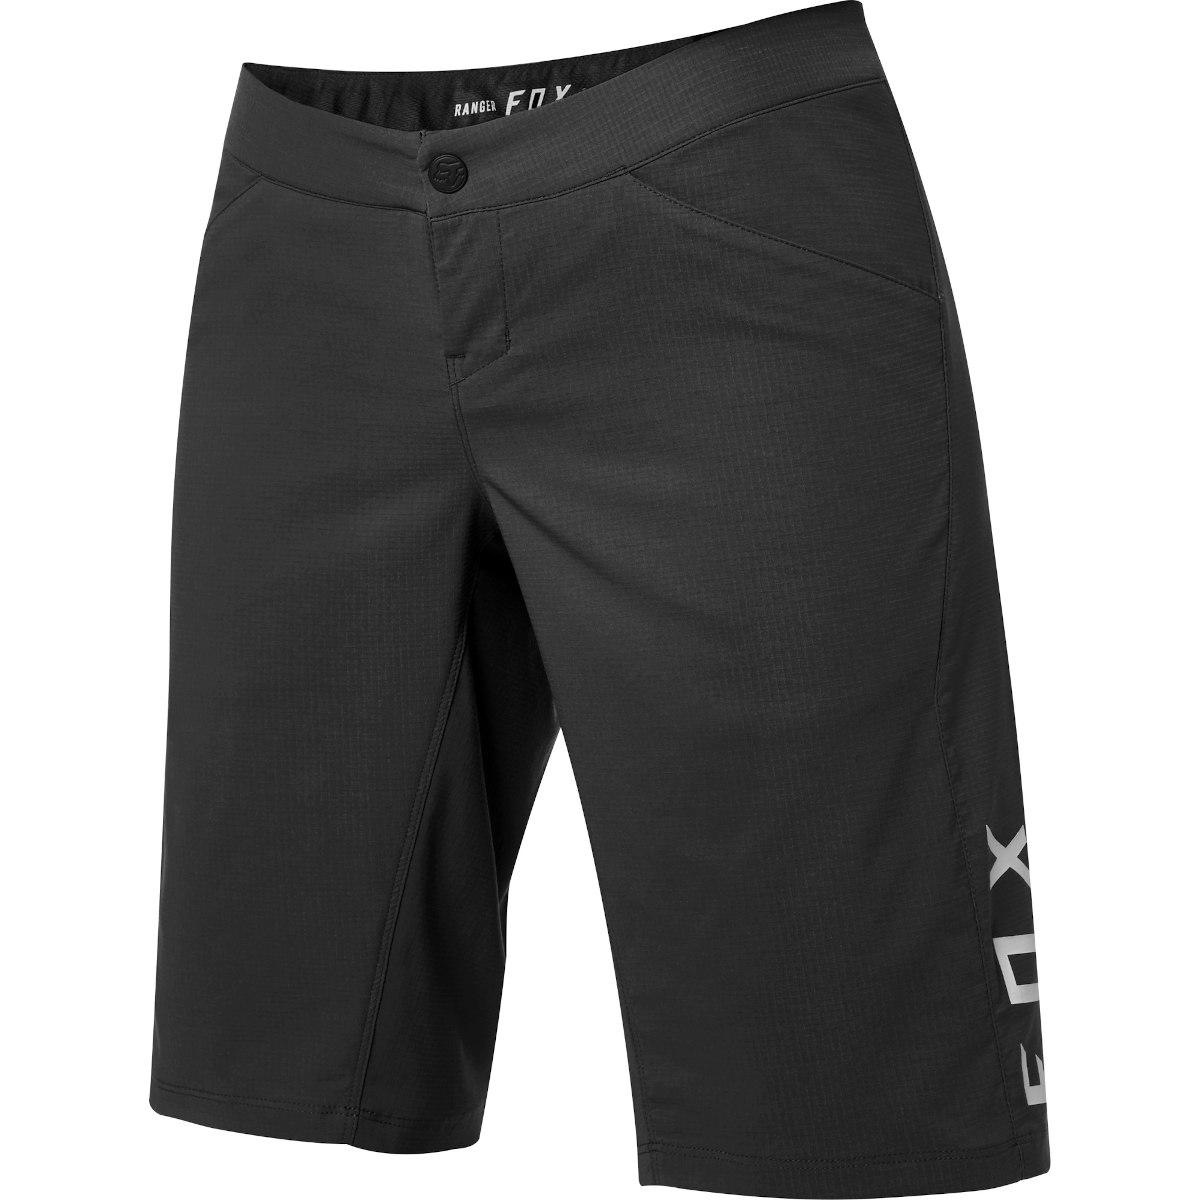 FOX Women's Ranger MTB Shorts - black